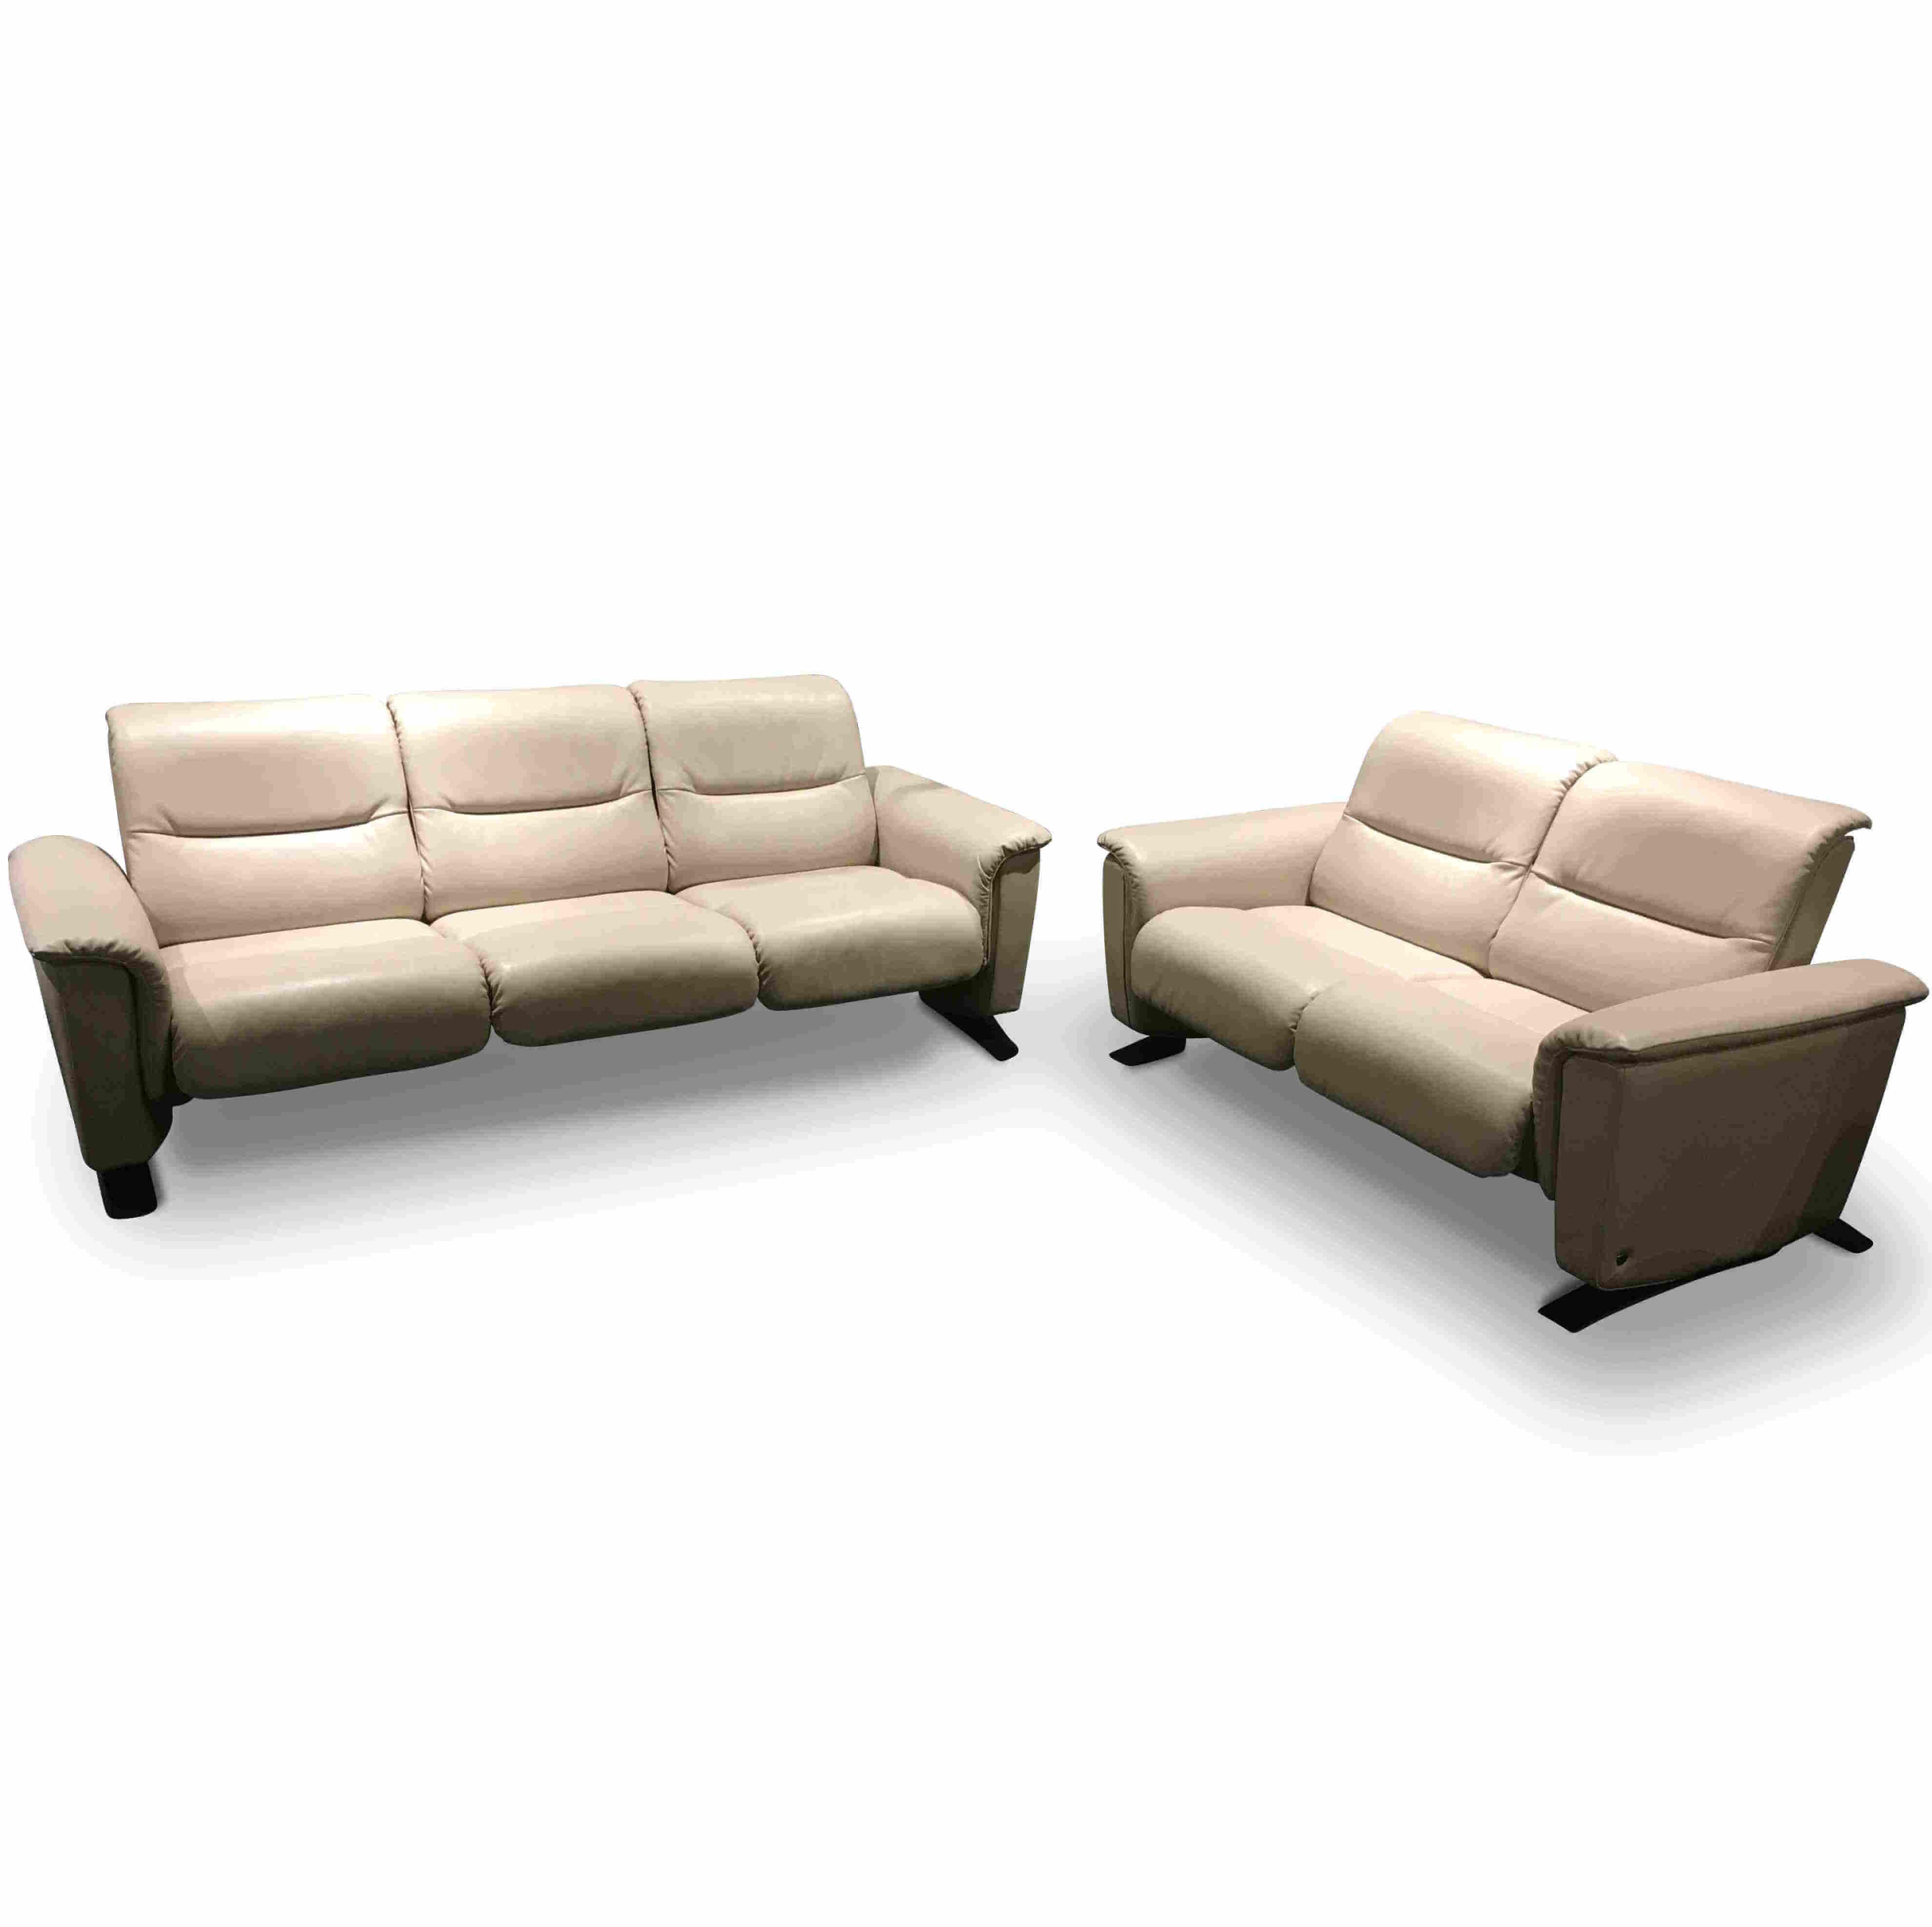 stressless designer garnitur panorama 3 sitzer 2 sitzer. Black Bedroom Furniture Sets. Home Design Ideas